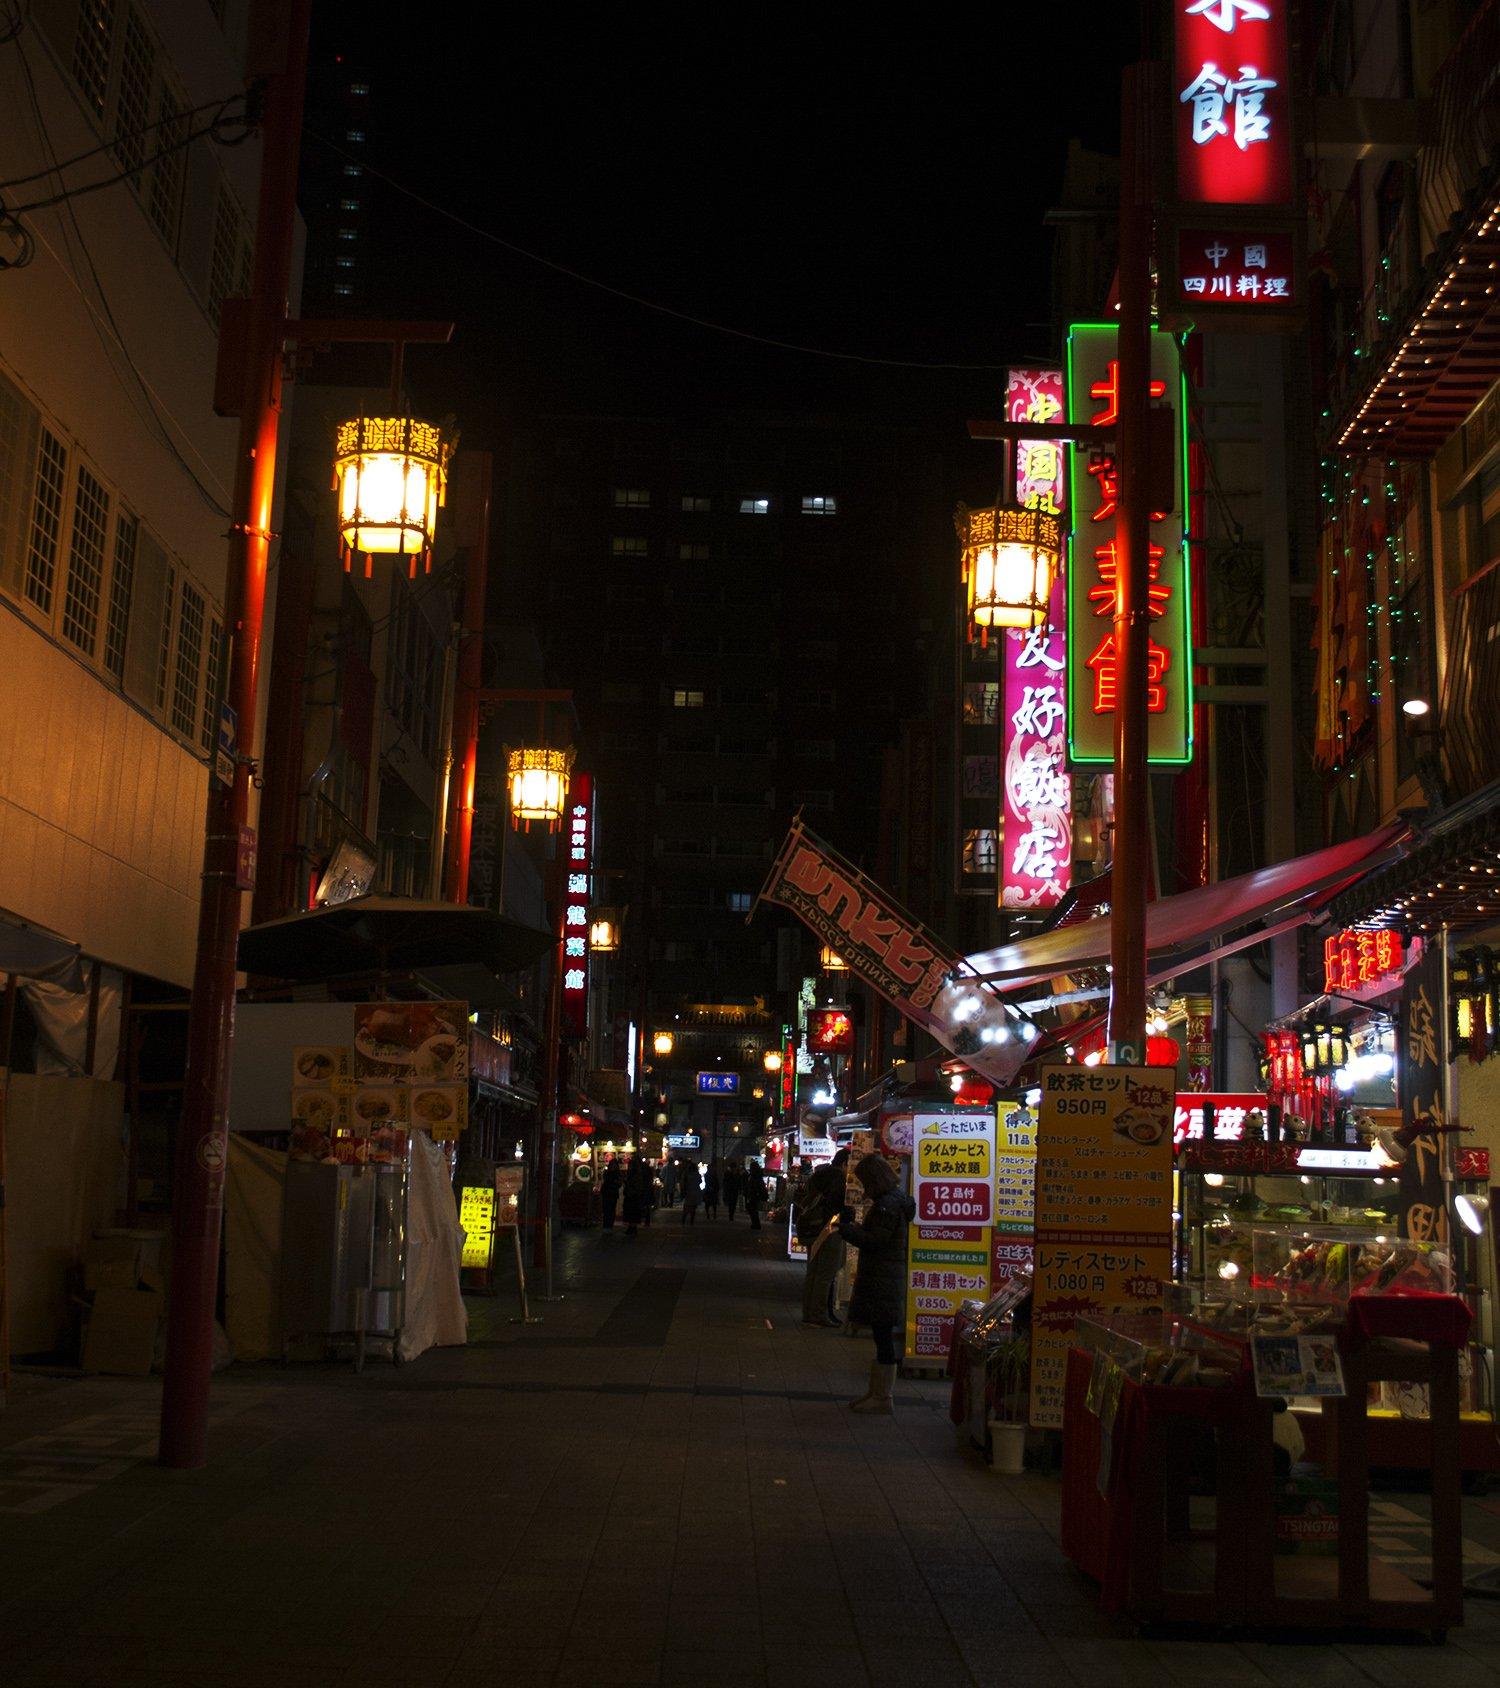 Calle de Nankinmachi o barrio chino de Kobe